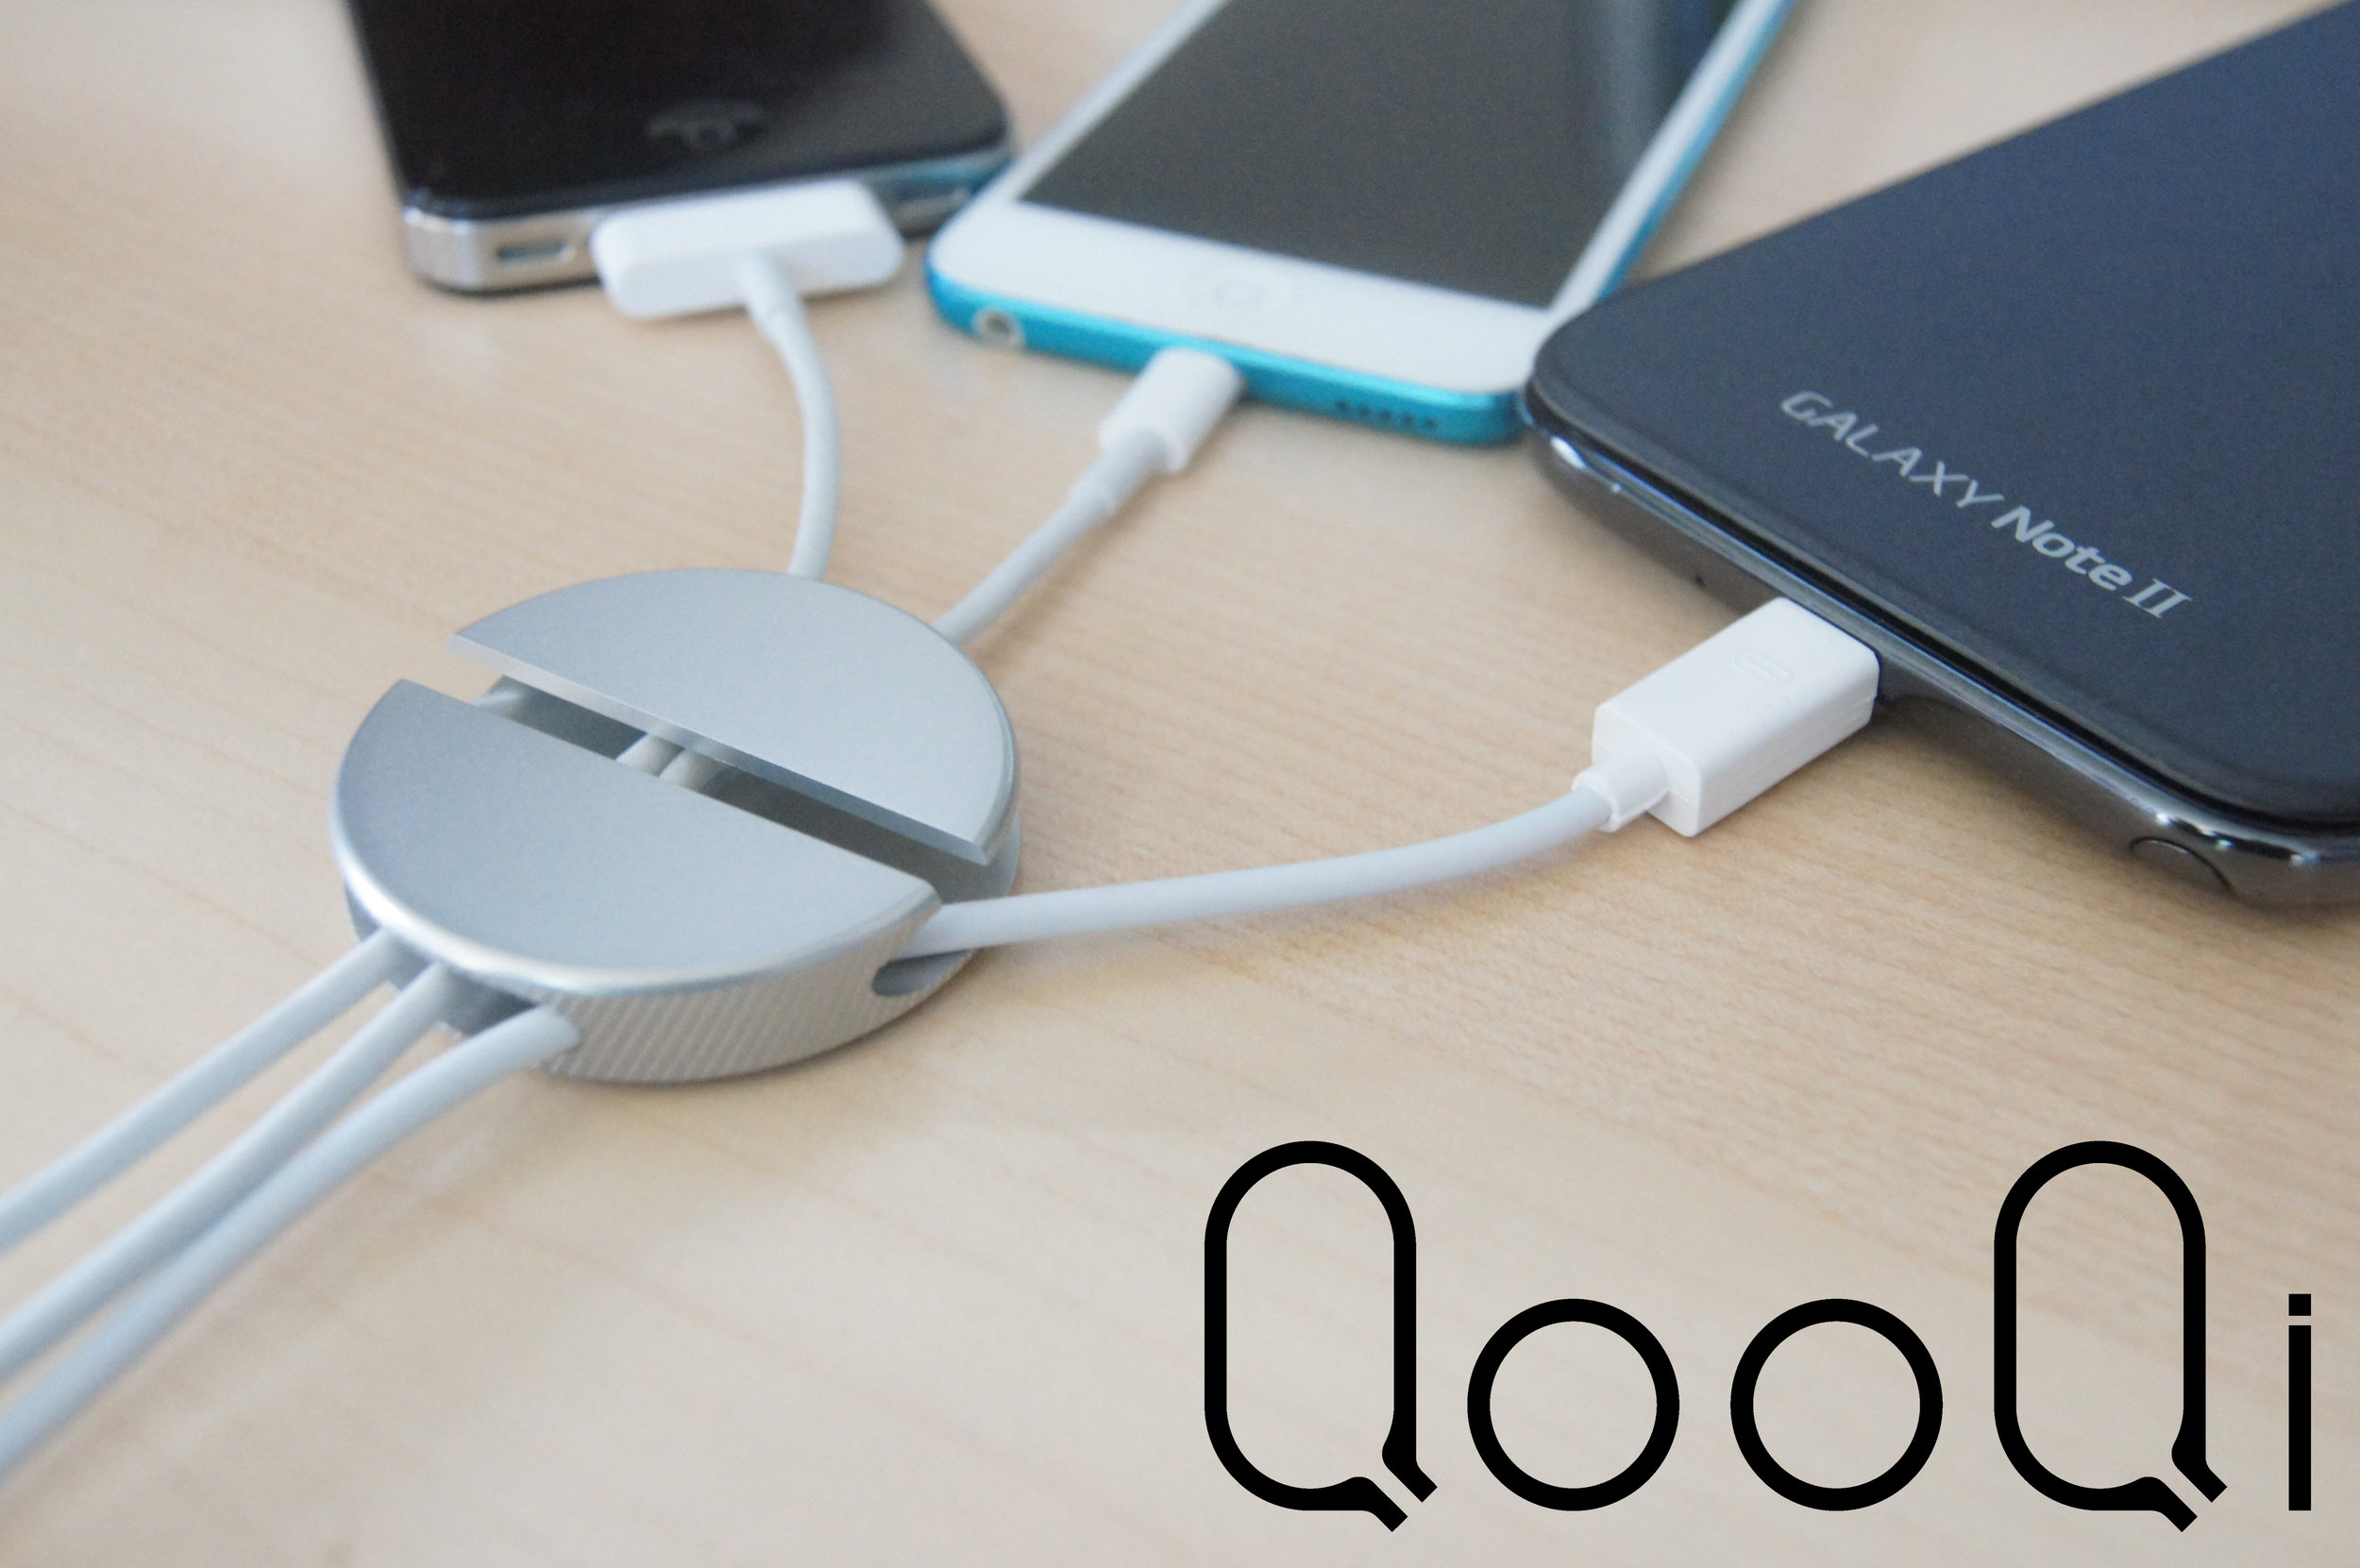 QooQi cable organizer - Funded $30kKICKSTARTER LINK